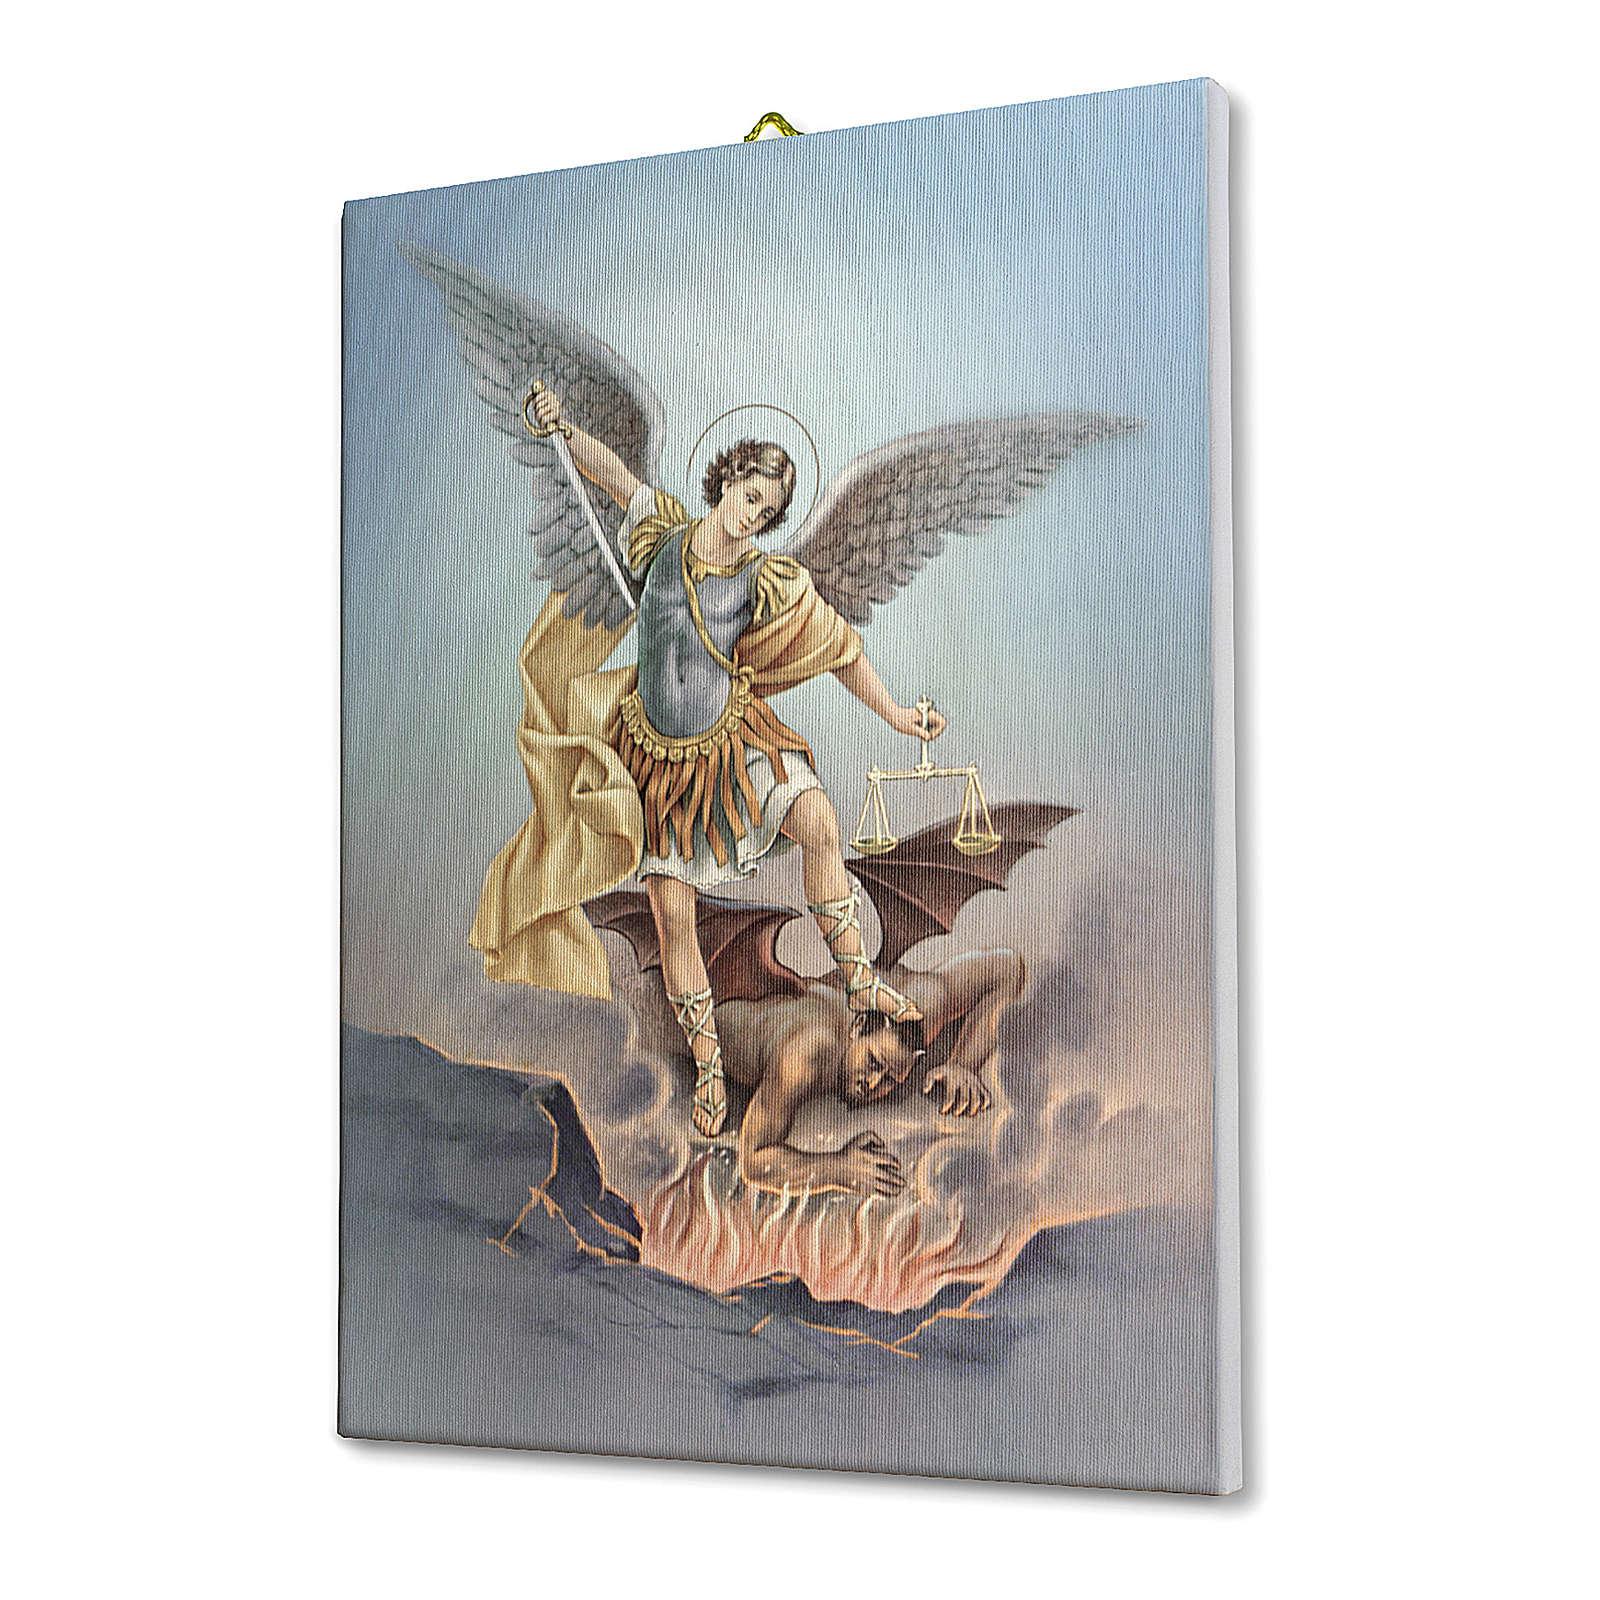 Quadro su tela pittorica San Michele Arcangelo 25x20 cm 3